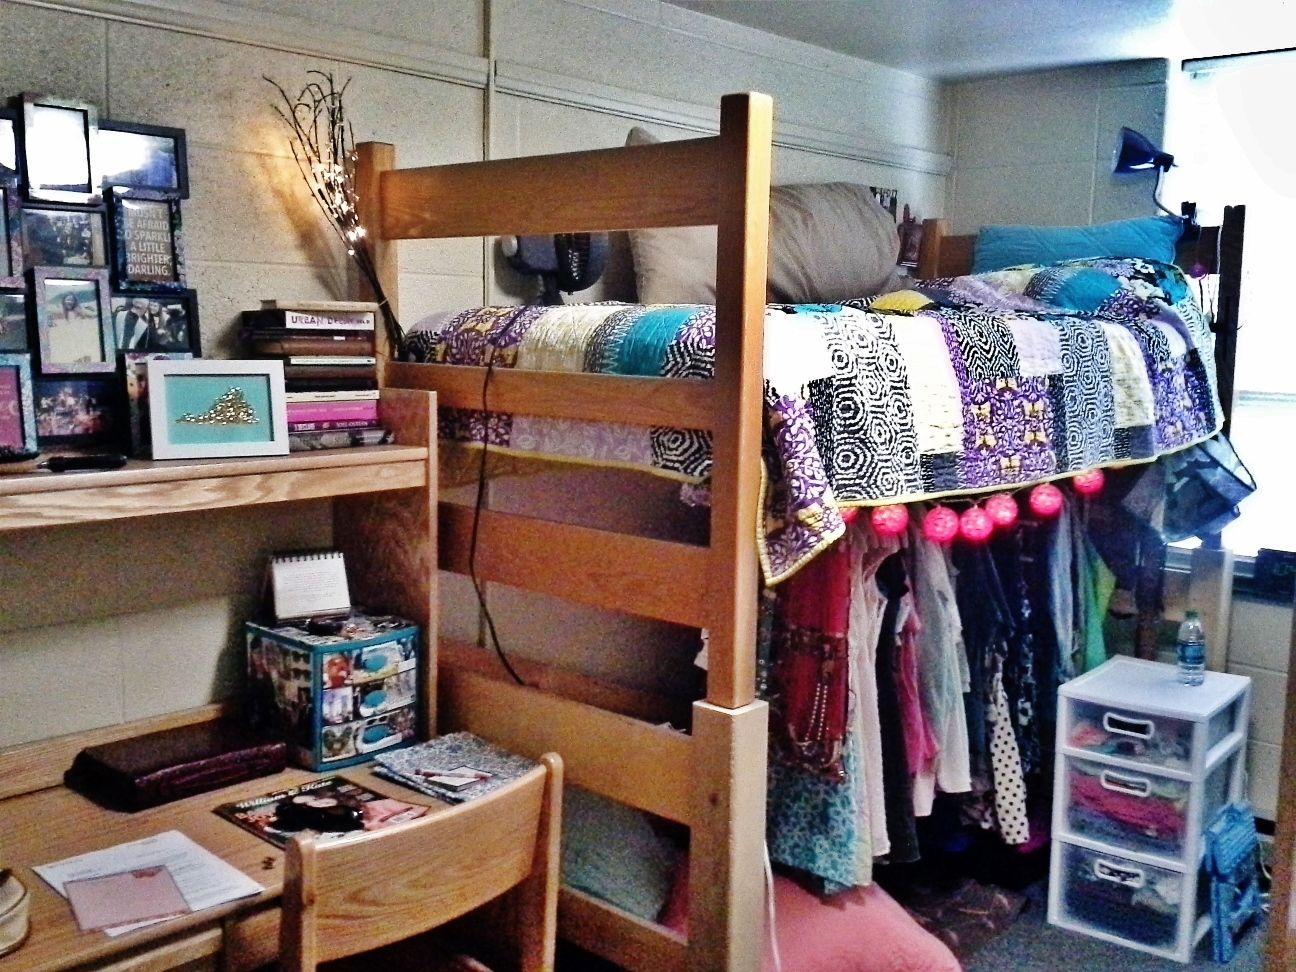 Dorm Room At Lehigh! Bed Lofts Make Amazing Closet Space!